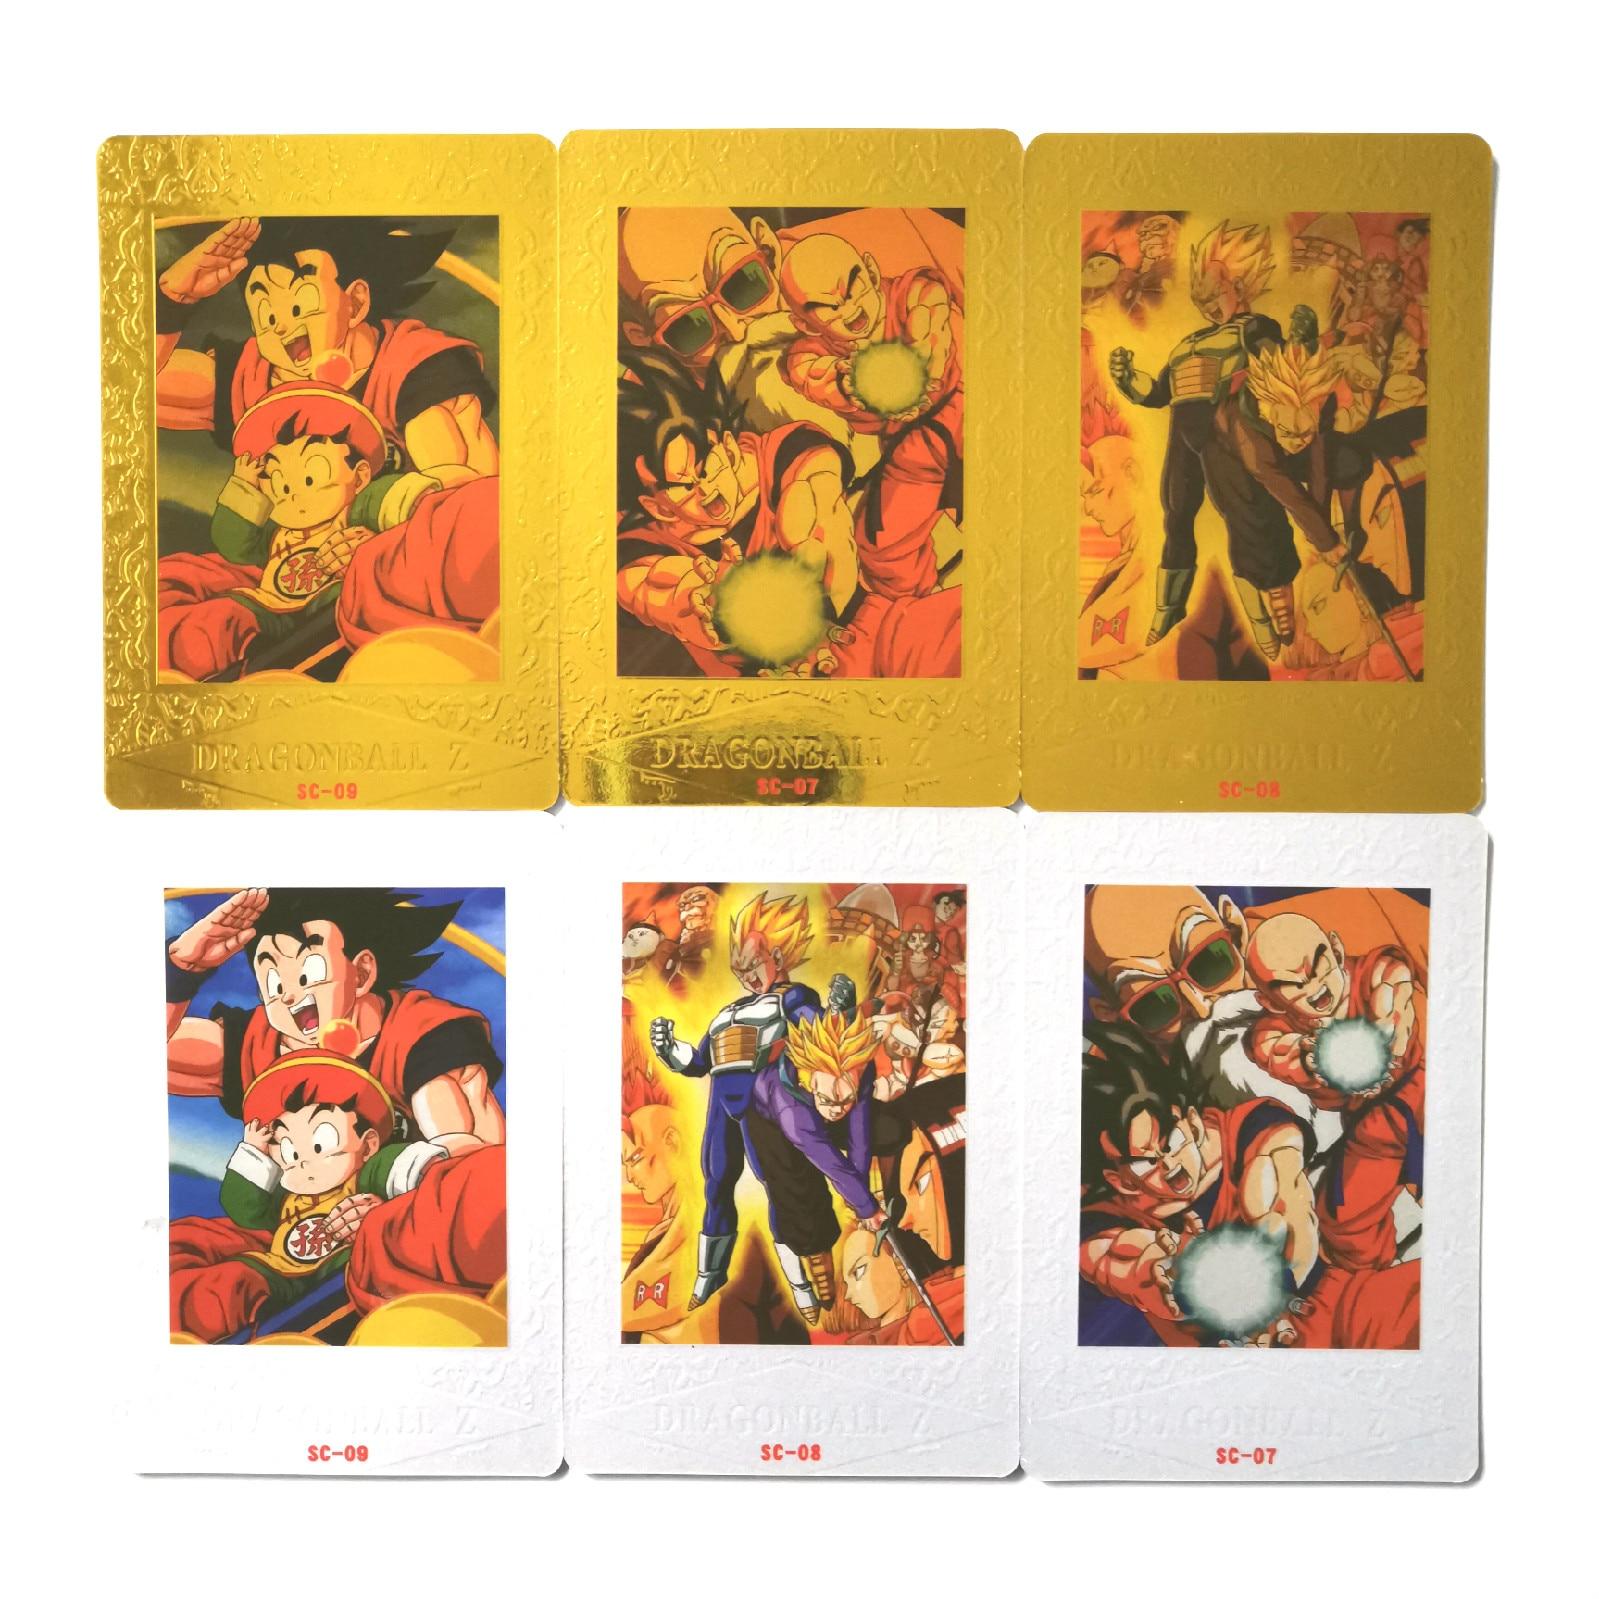 27pcs/set MAX5 Super Dragon Ball Z Heroes Battle Card Ultra Instinct Goku Vegeta Game Collection Cards